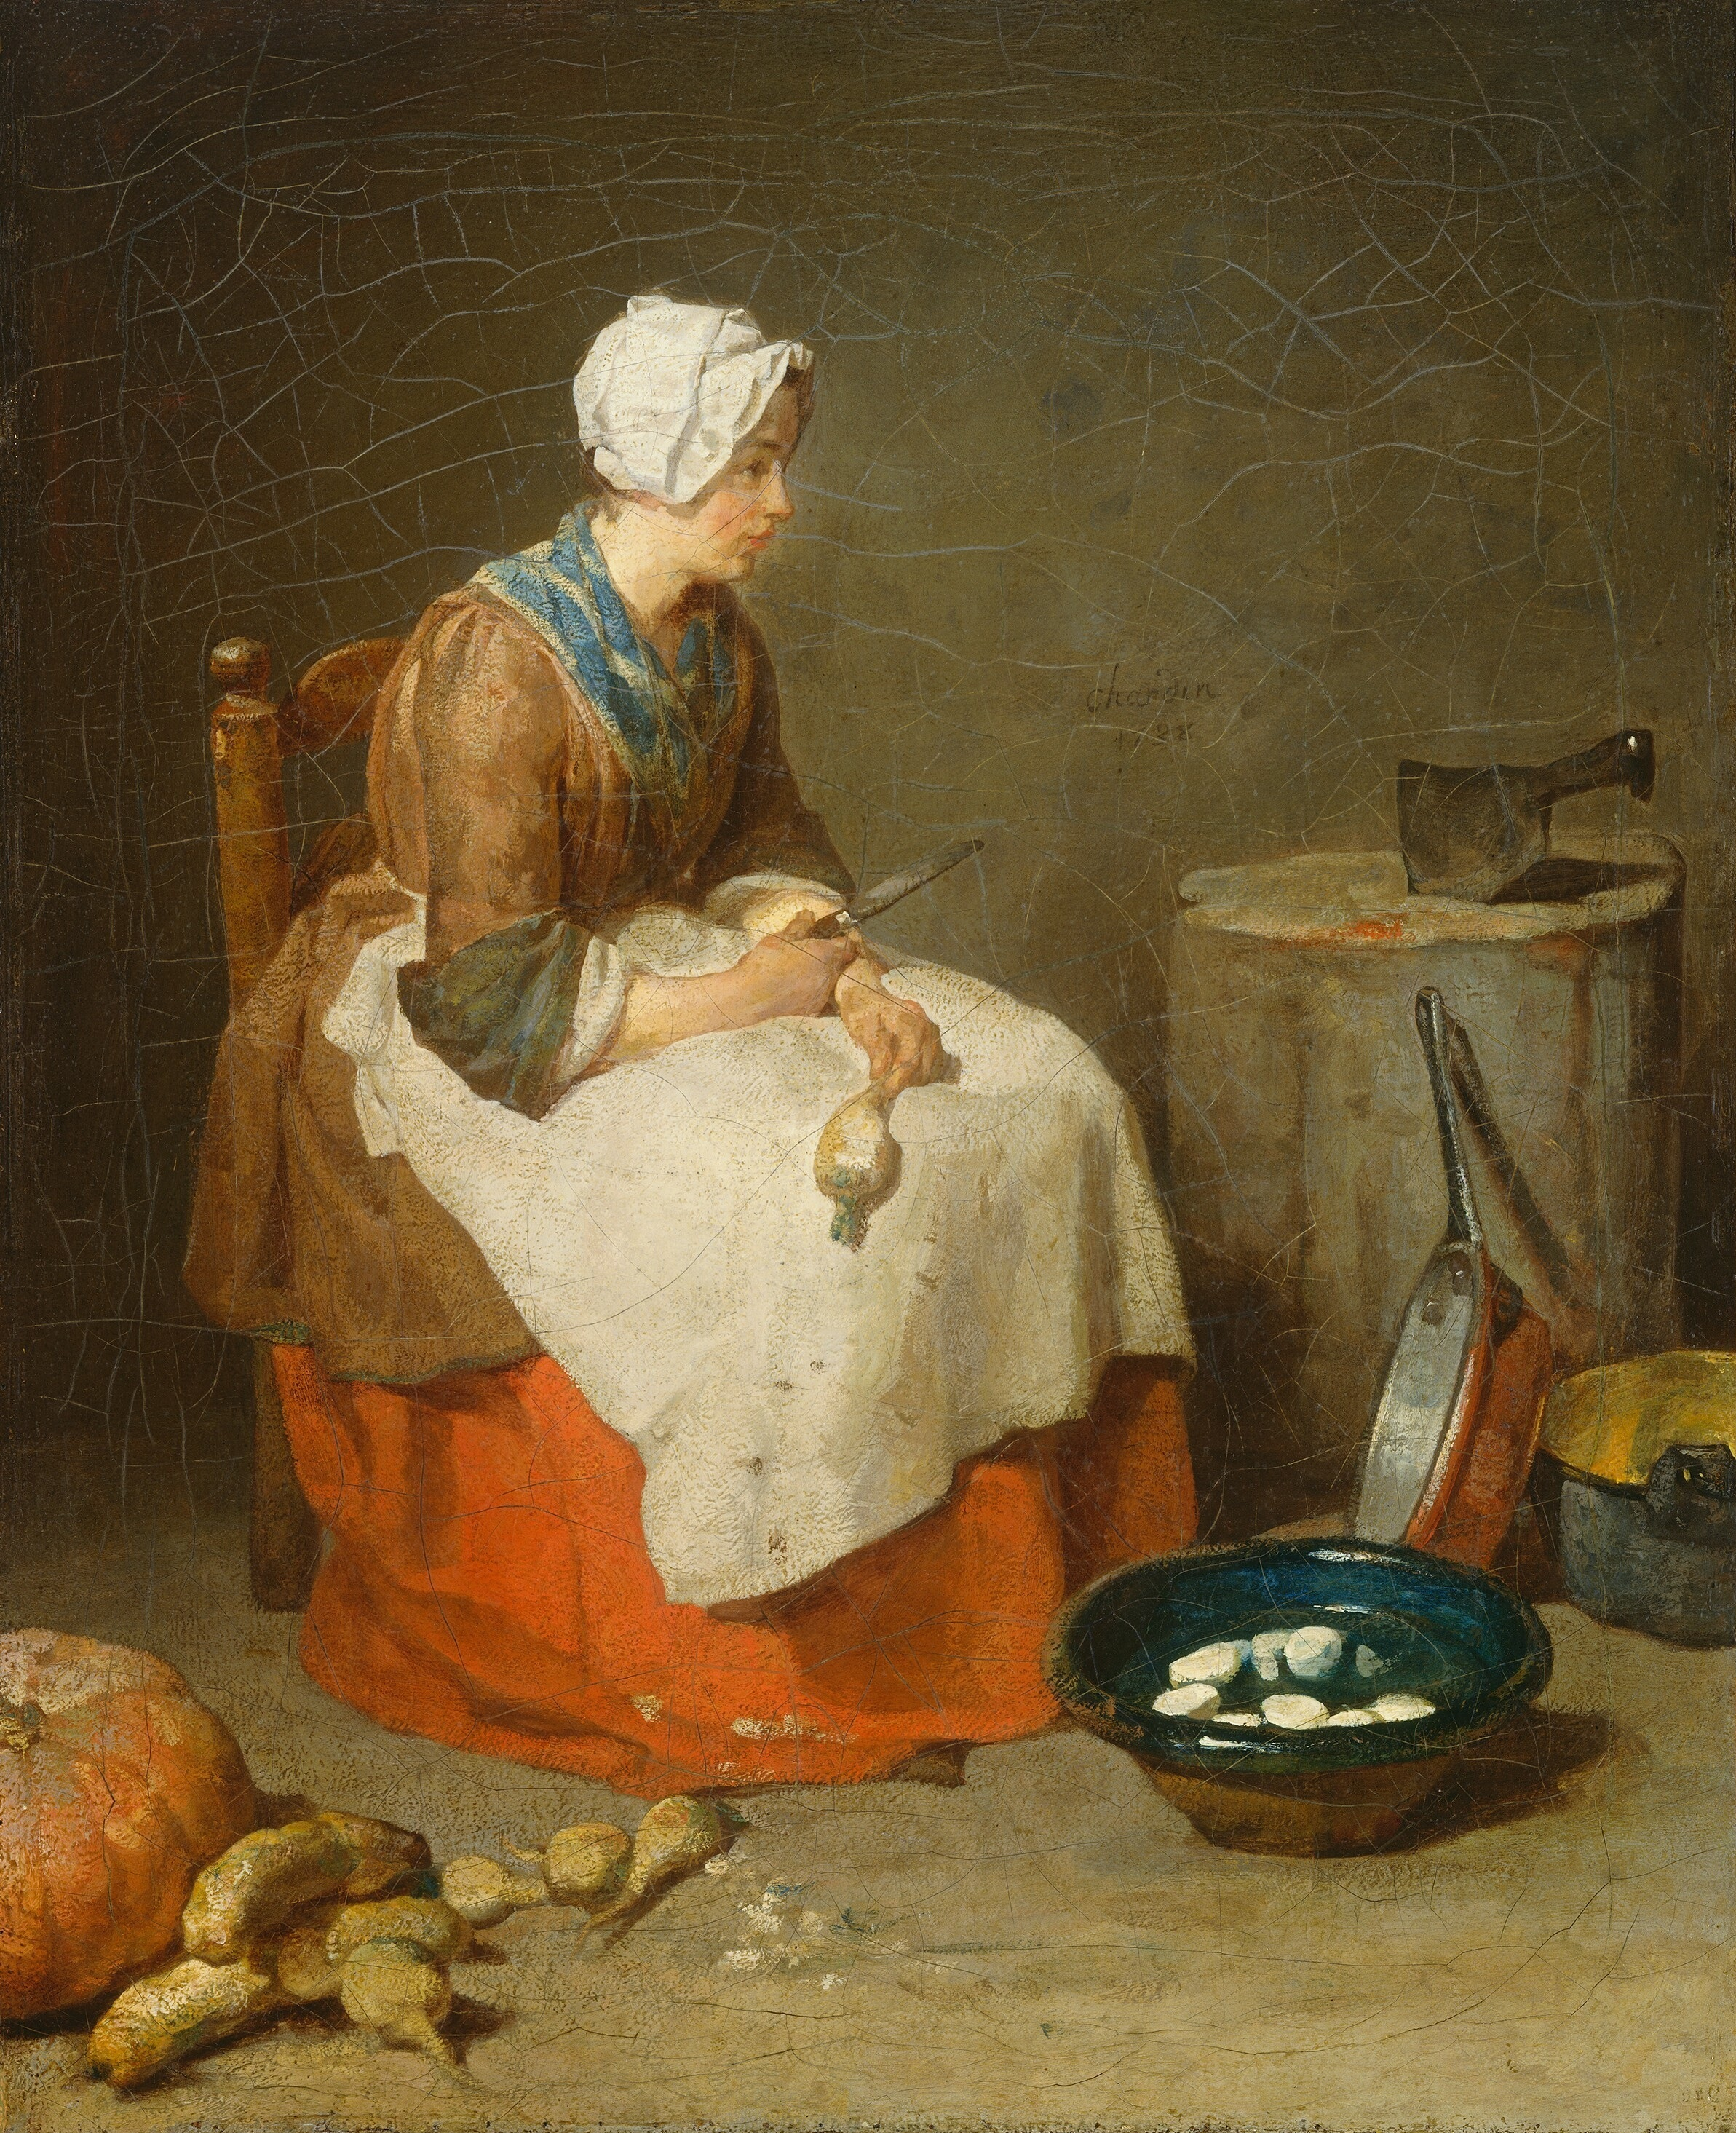 kitchen maid - meddic